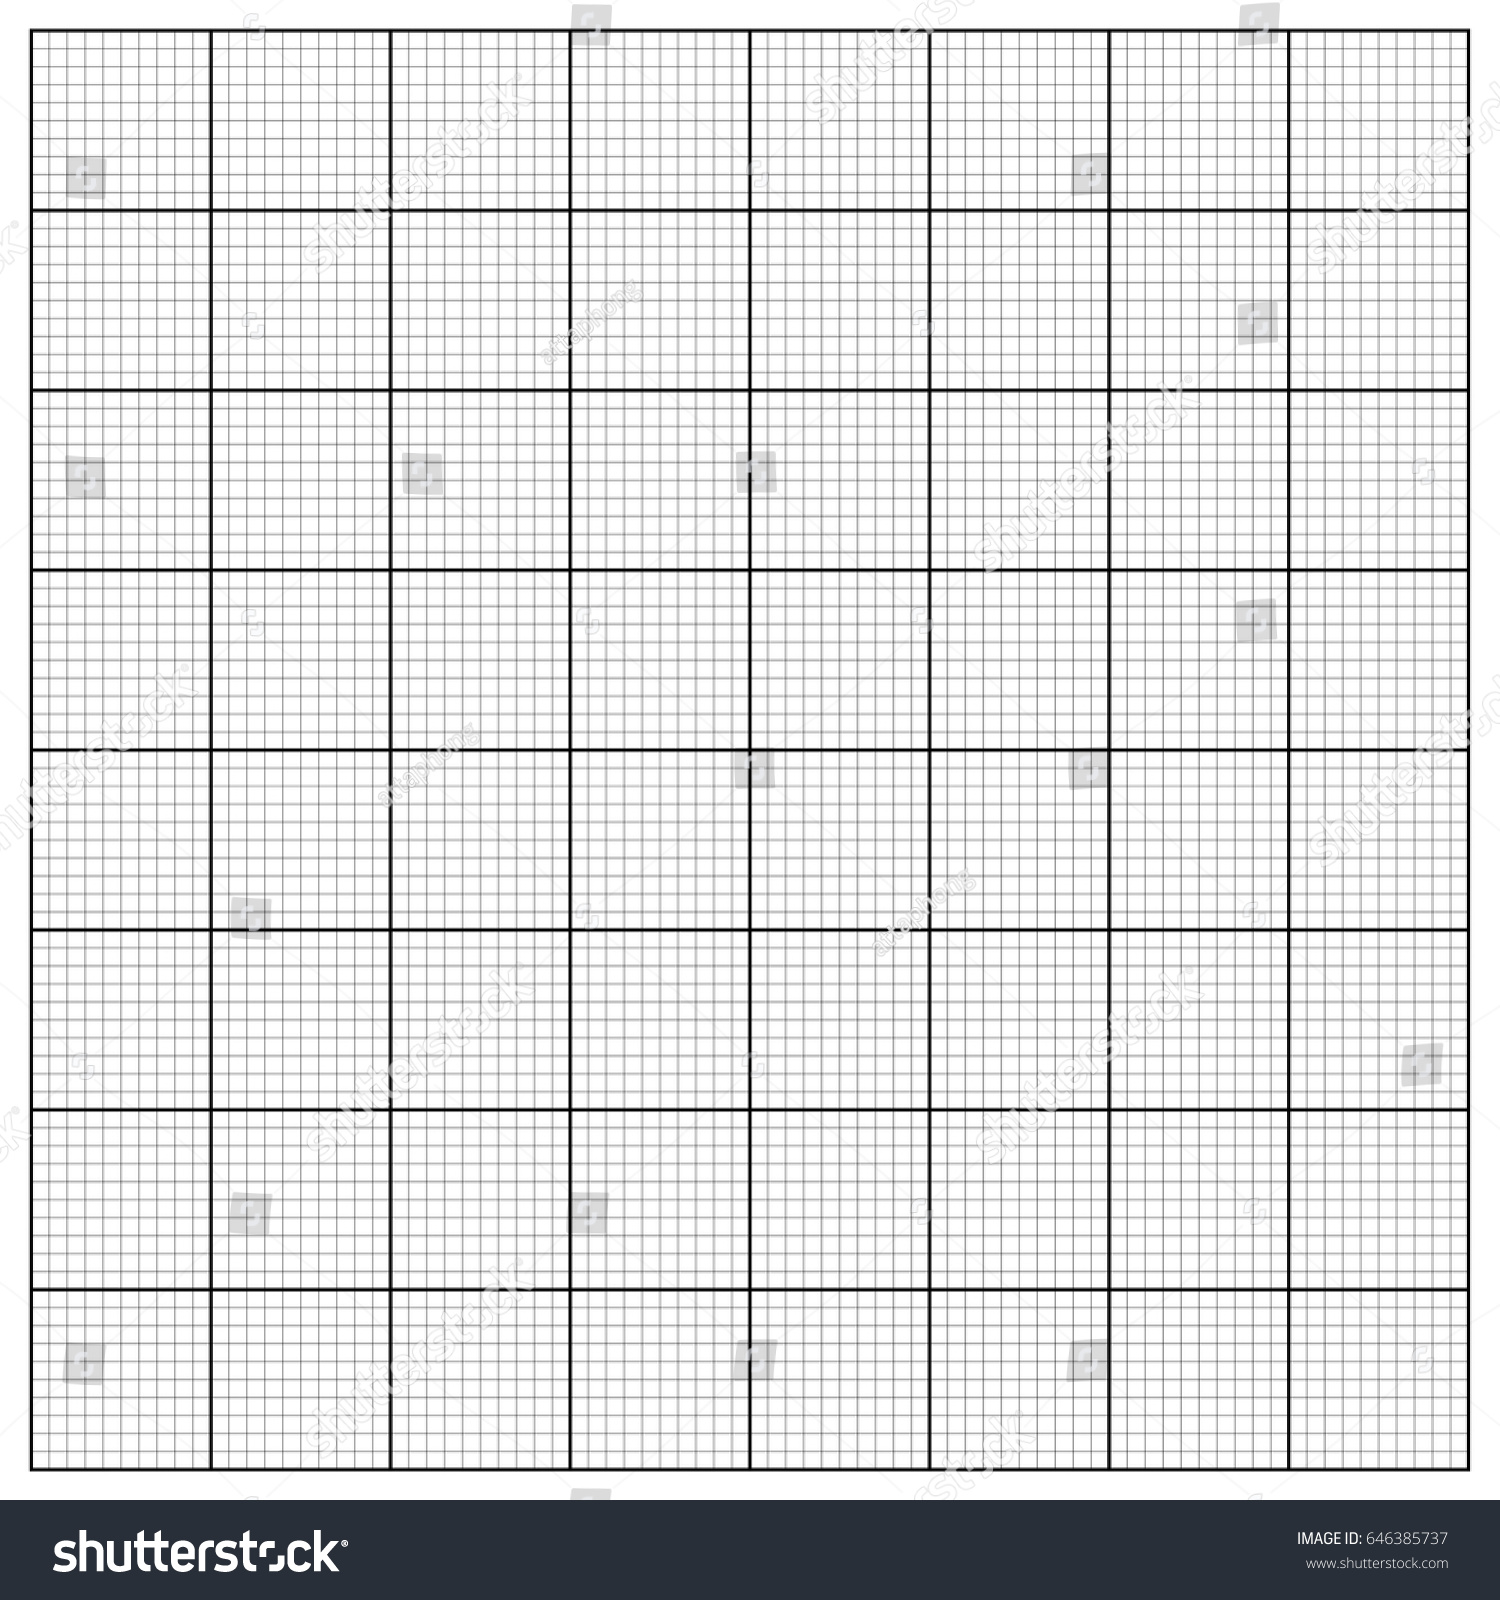 Worksheet Grid And Graph It Grass Fedjp Worksheet Study Site